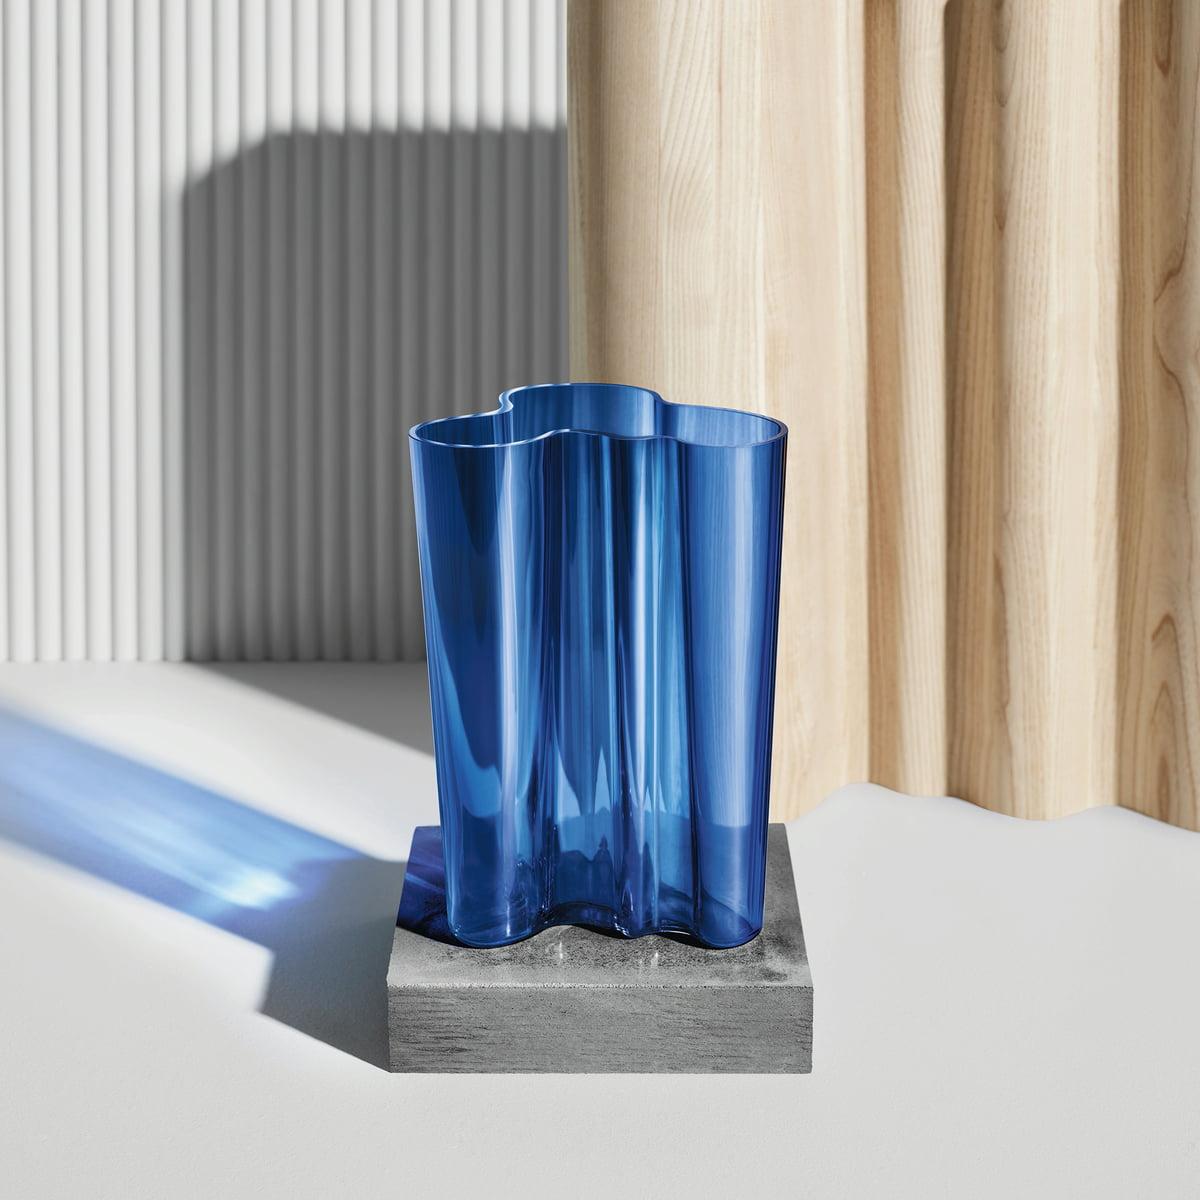 Aalto finlandia vase by iittala in the shop aalto vase finlandia by iittala in ultramarine blue reviewsmspy